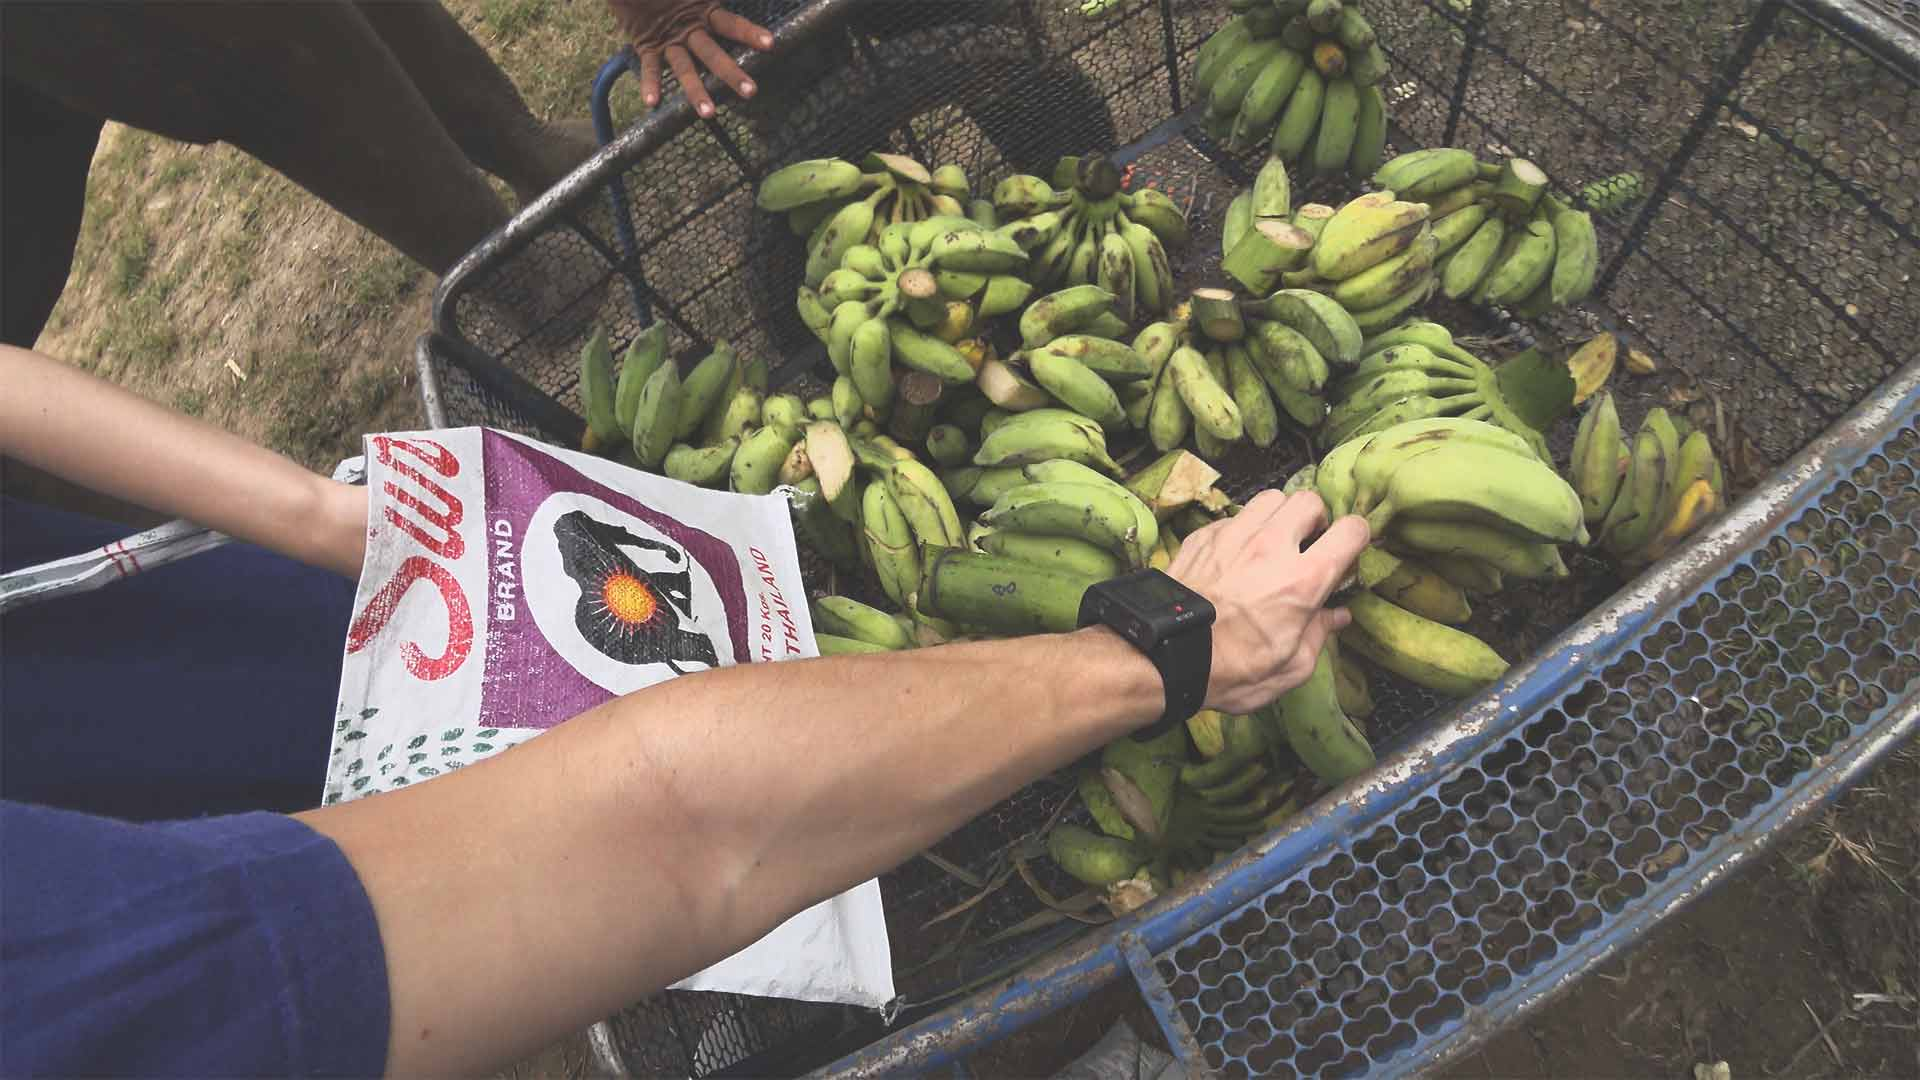 Elefantentour - Chiang Mai Mountain Sanctuary - Bananen auffüllen